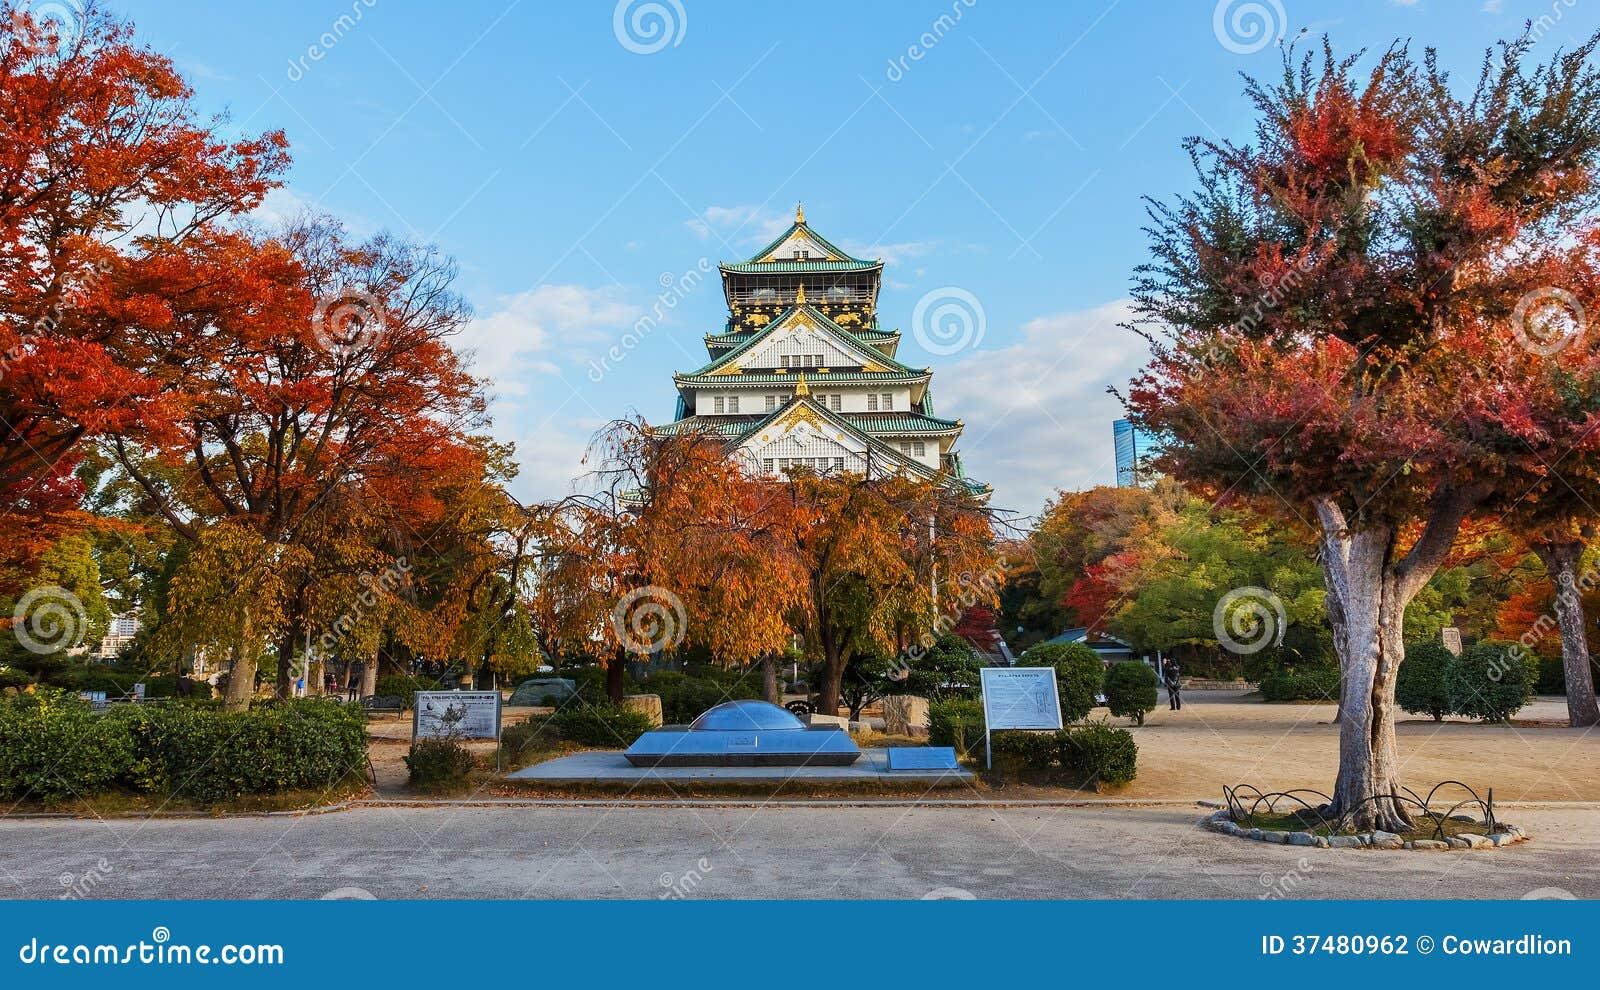 Osaka castle in Autumn stock photo. Image of sightseeing - 37480962